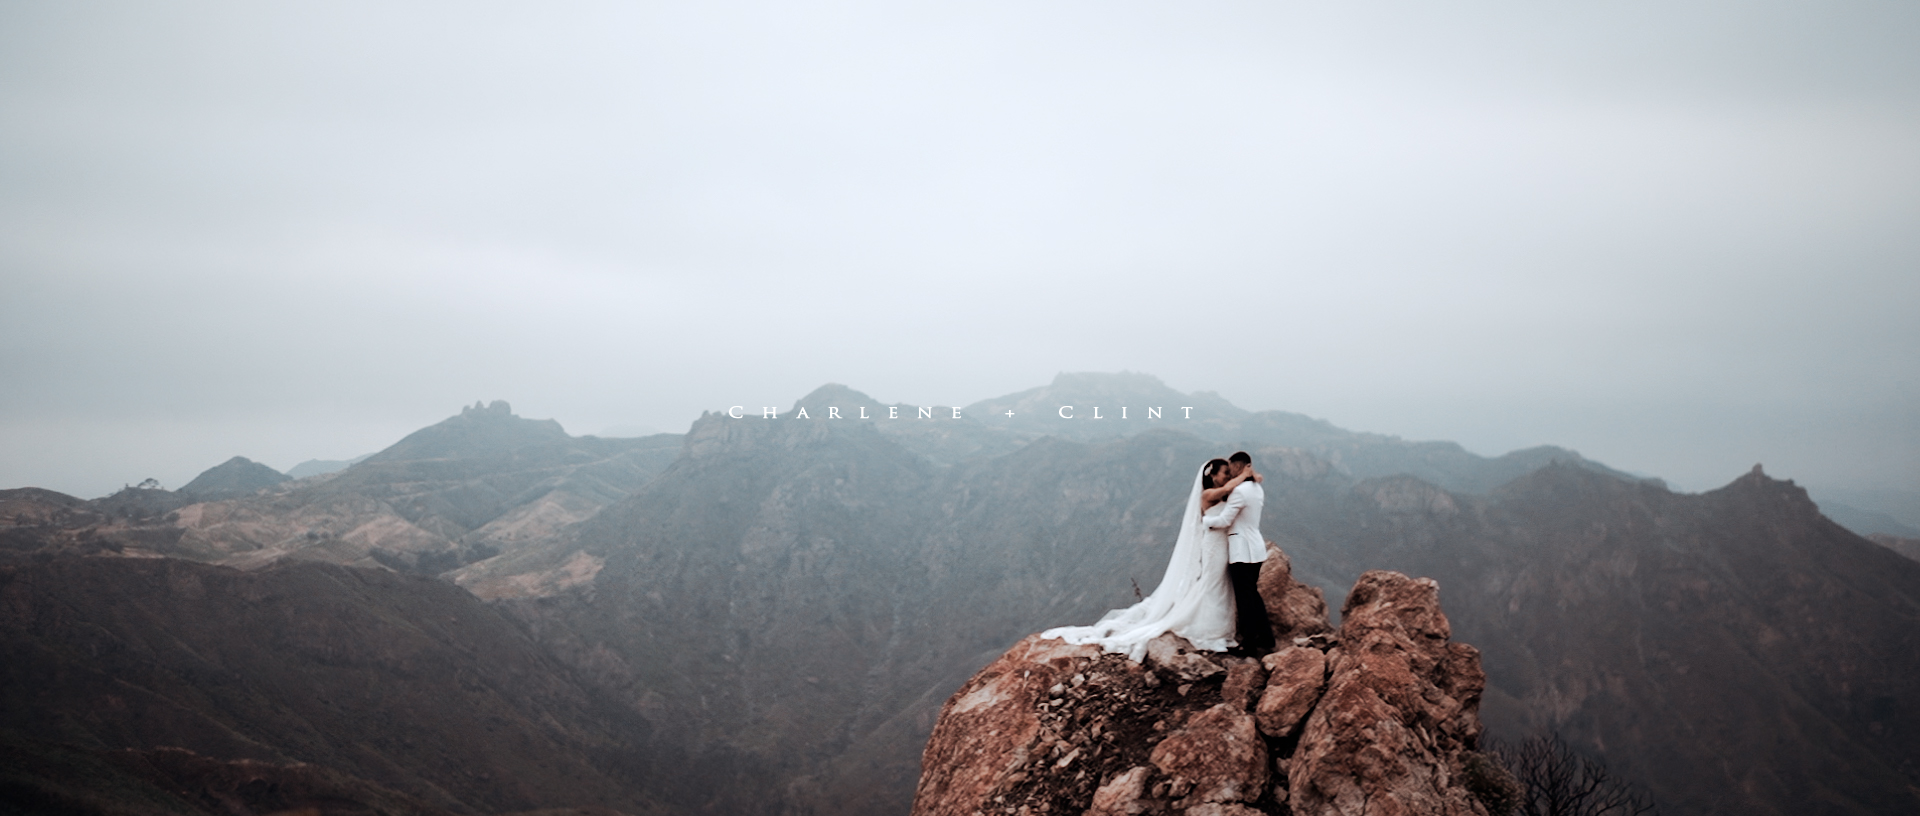 Charlene + Clint | Malibu, California | Malibu Rocky Oaks